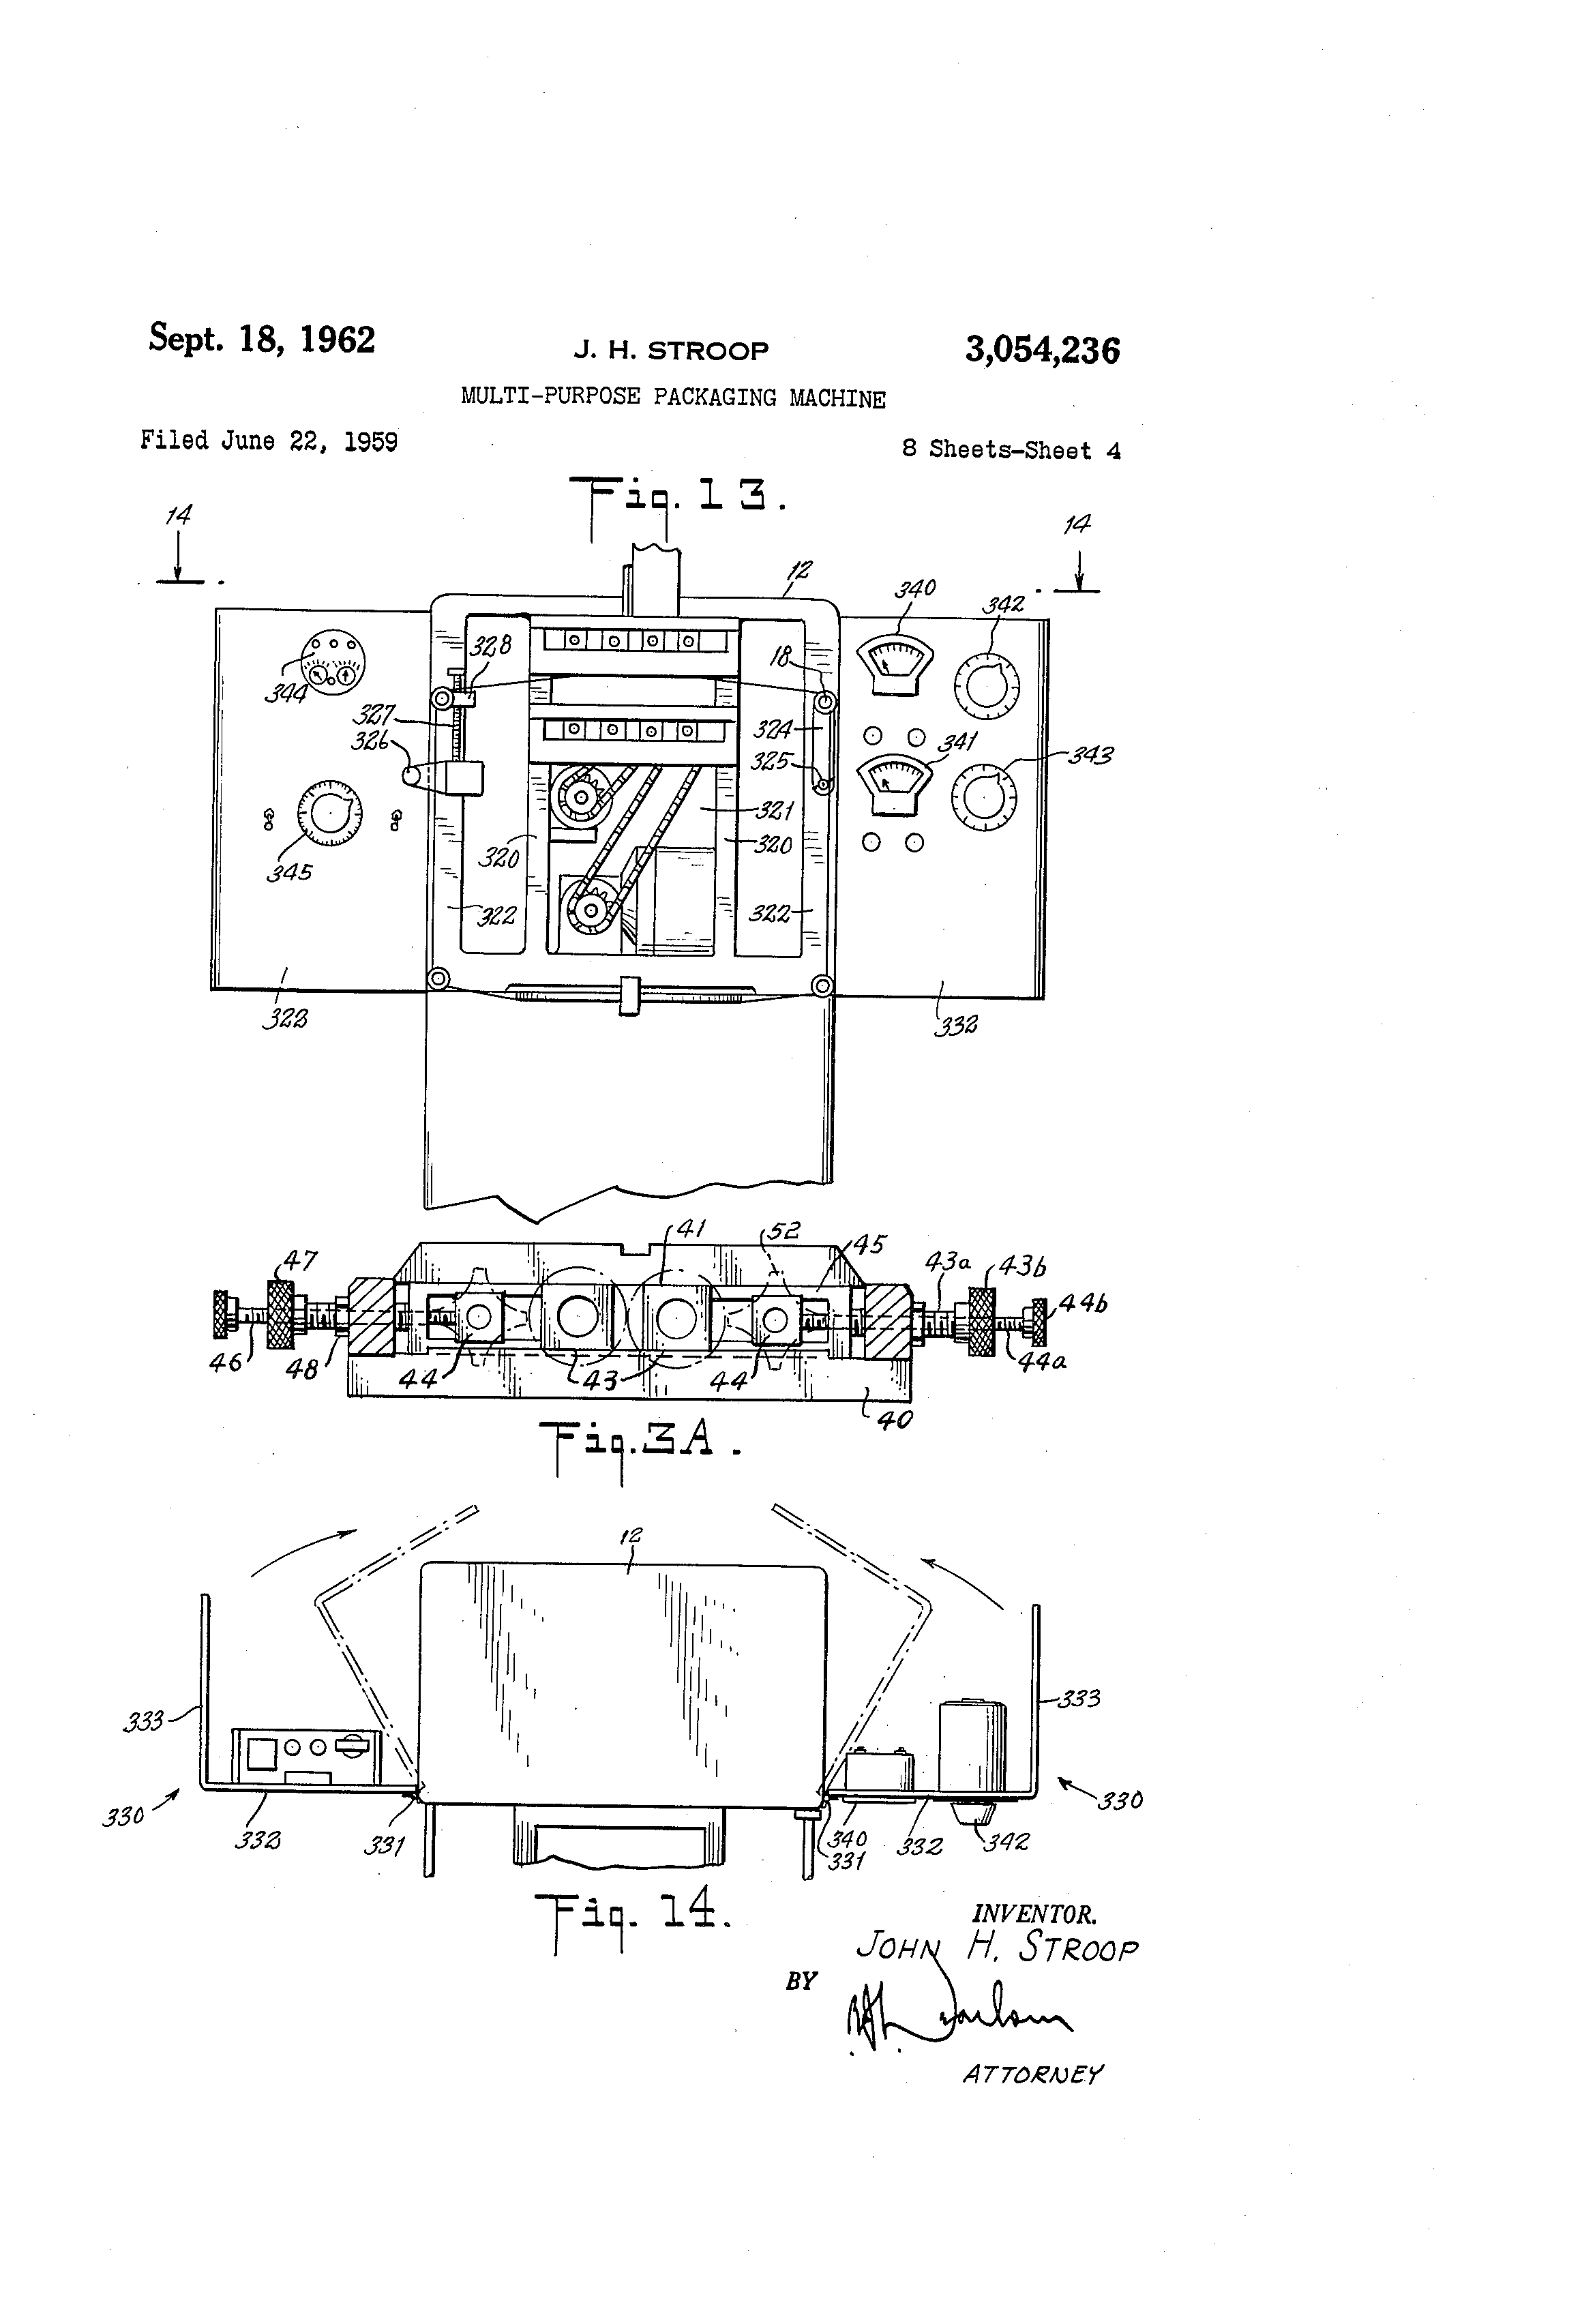 [DIAGRAM_38YU]  NR_5590] Wiring Diagram For Ford 7600 Tractor Free Download Download Diagram | Wiring 7600 Diagram Tractor 1976 Ford |  | Www Mohammedshrine Librar Wiring 101